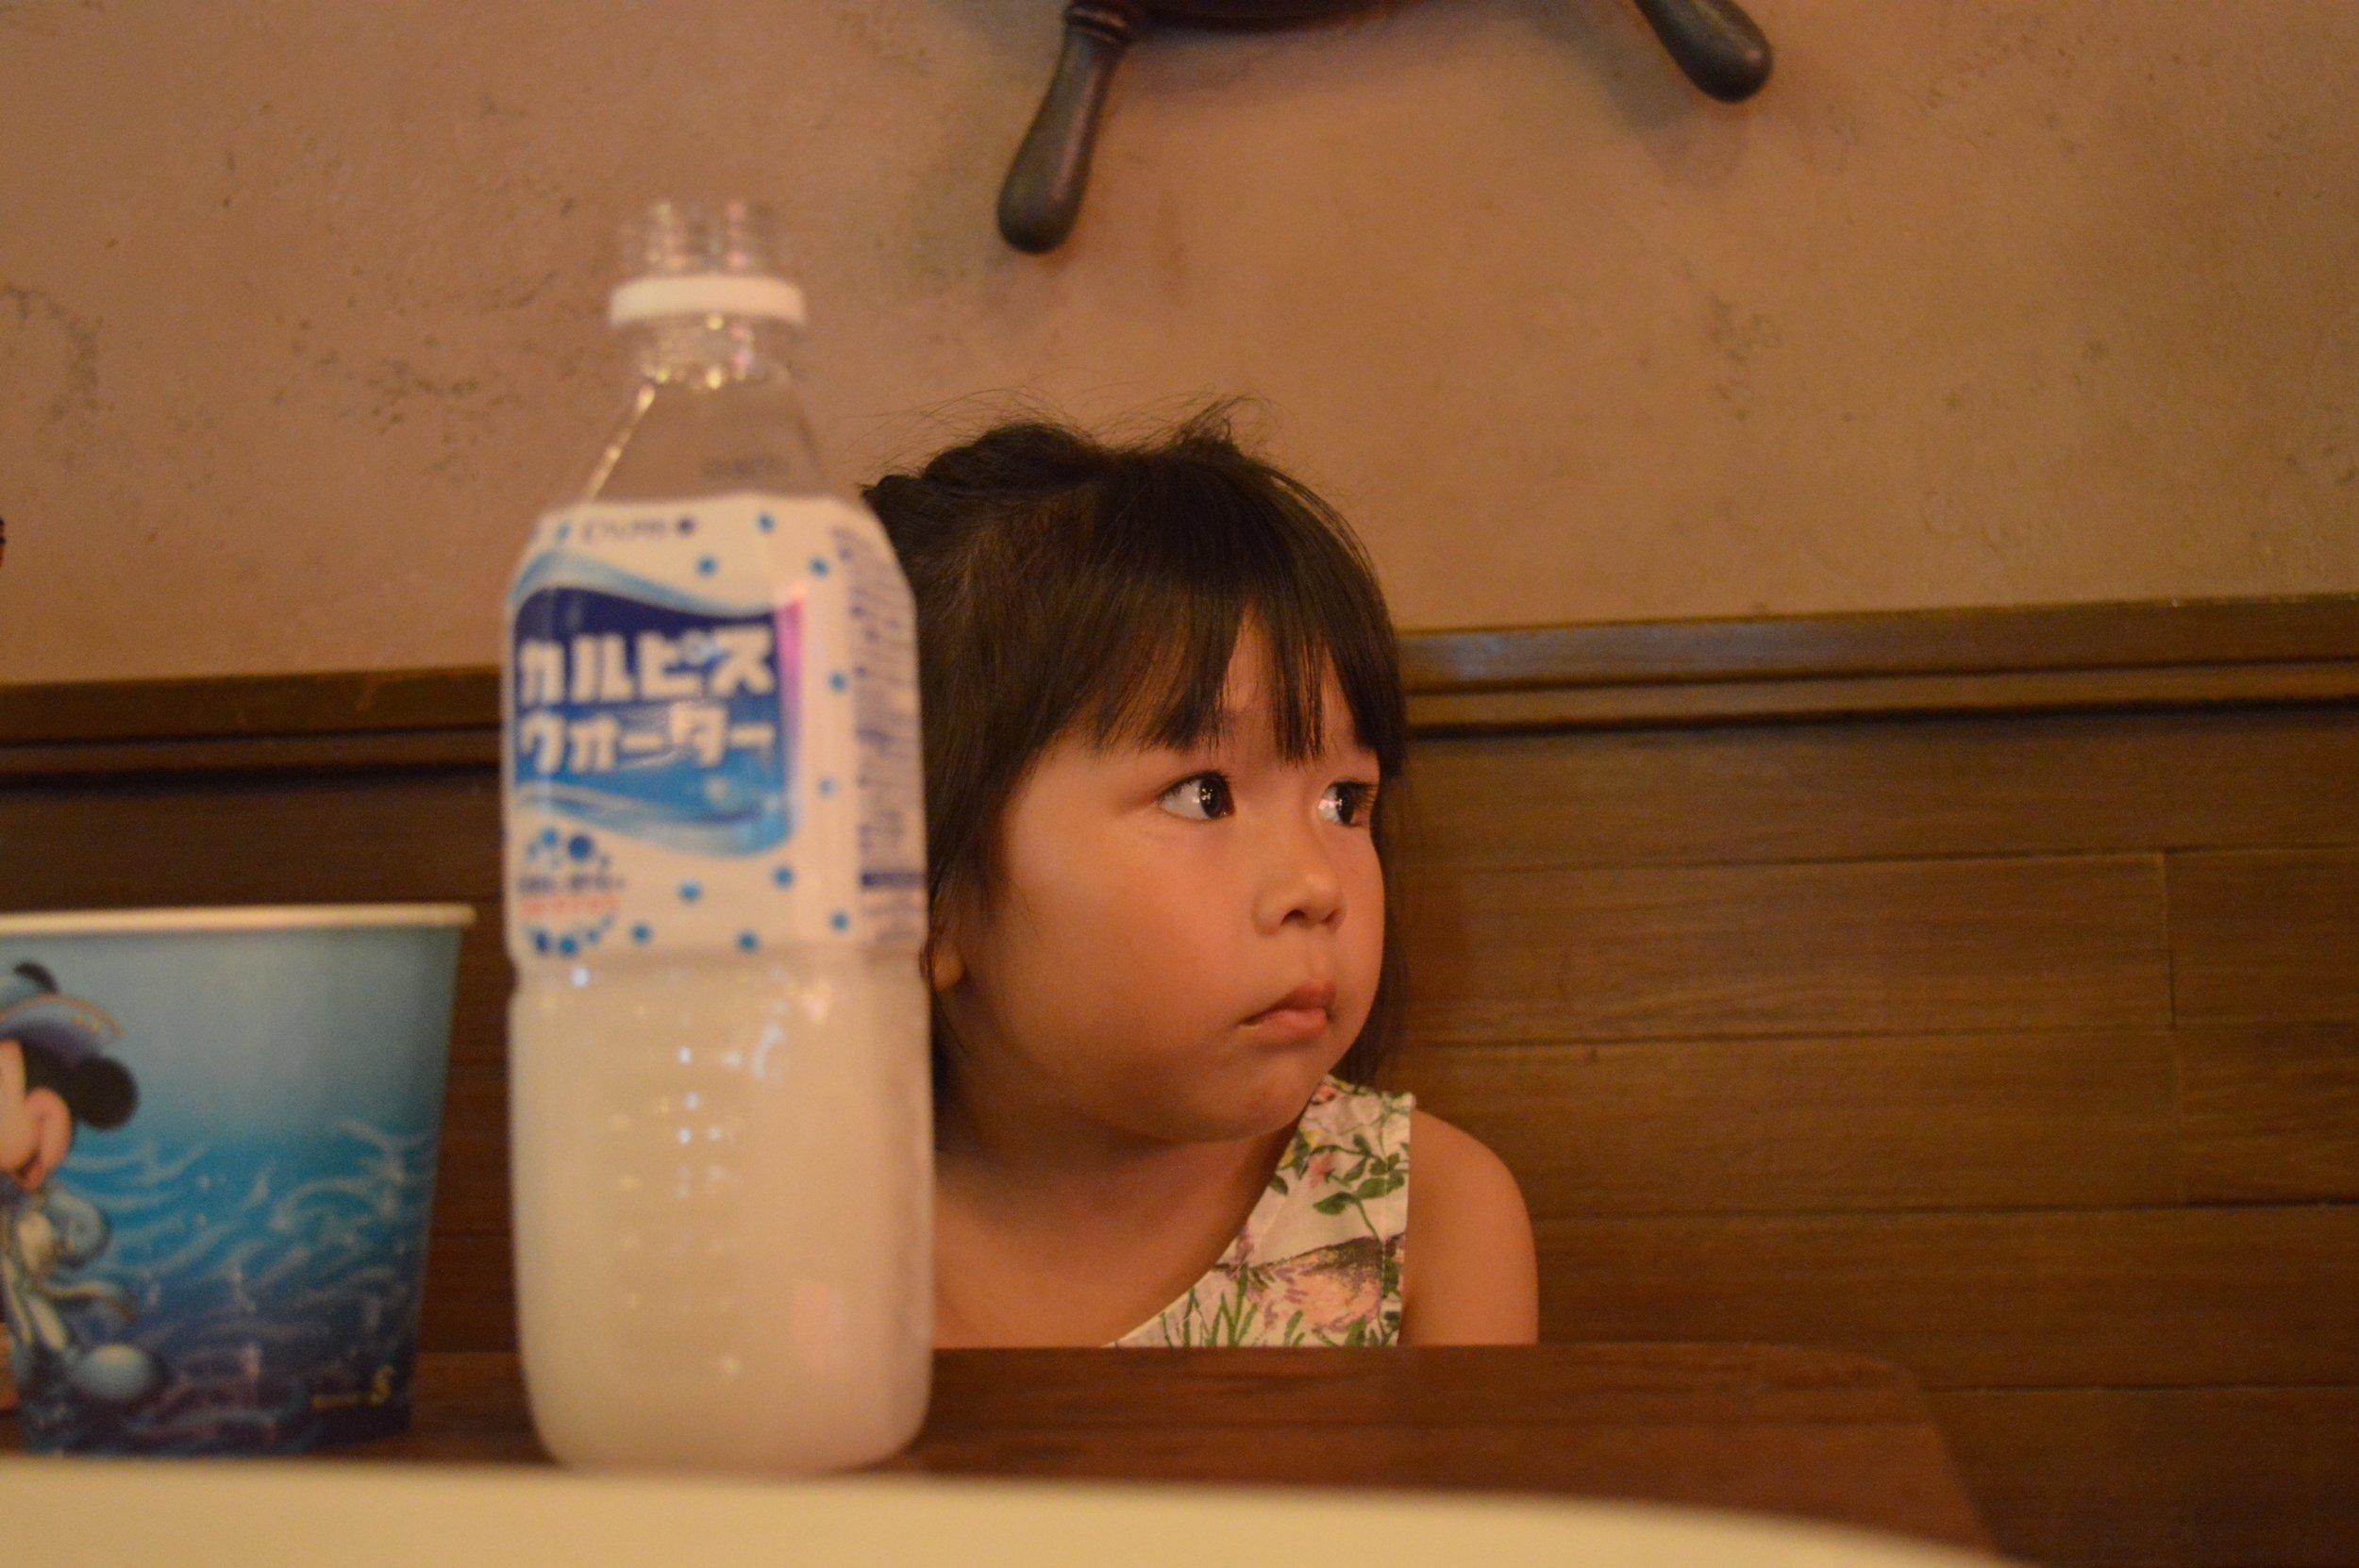 Little Mahina fixated on the show